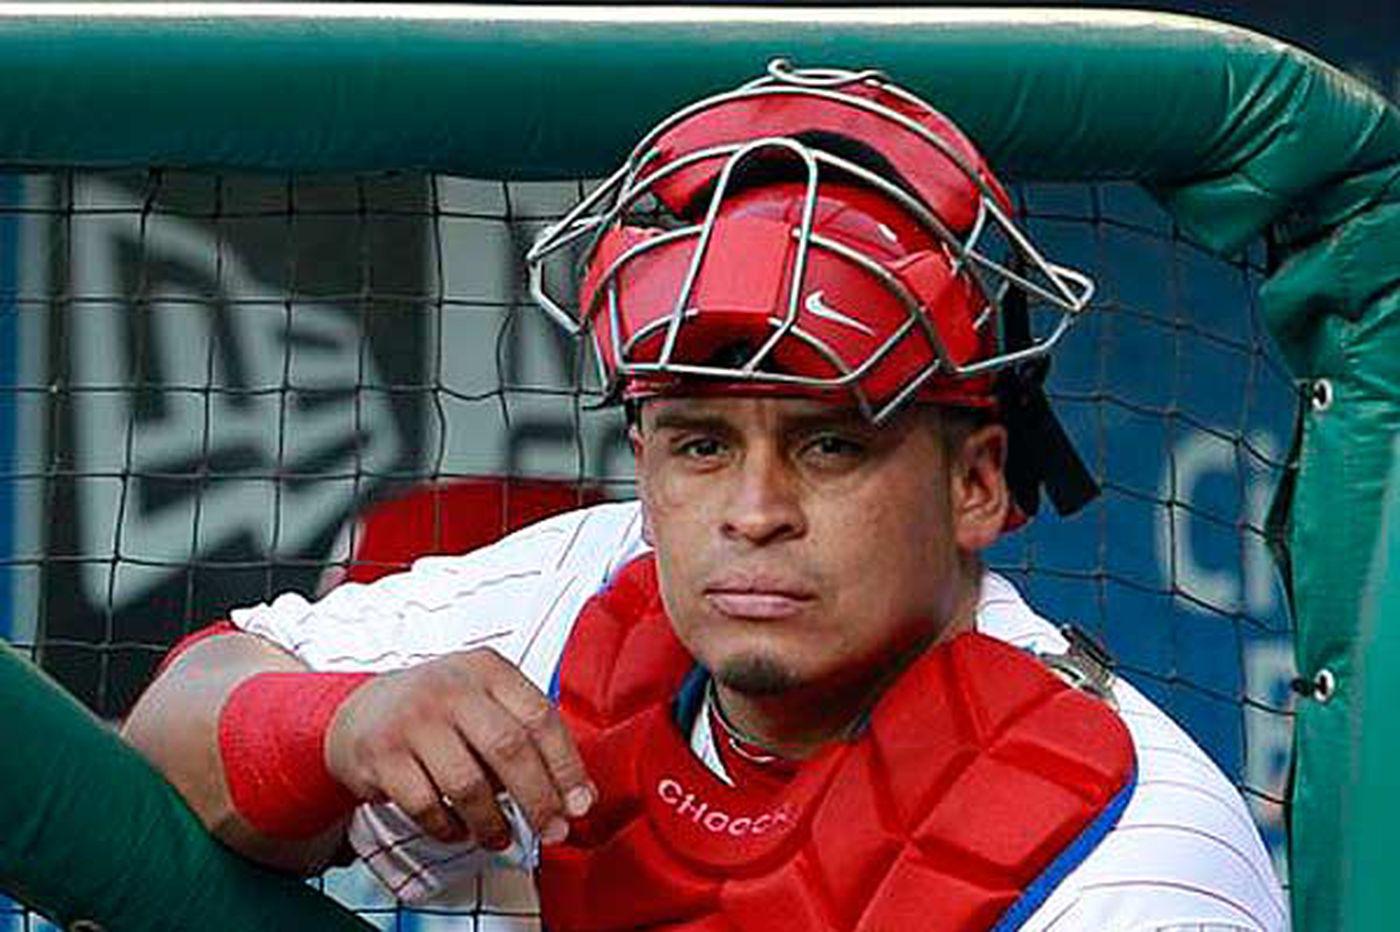 Phillies catcher Carlos Ruiz breaks out in 2012